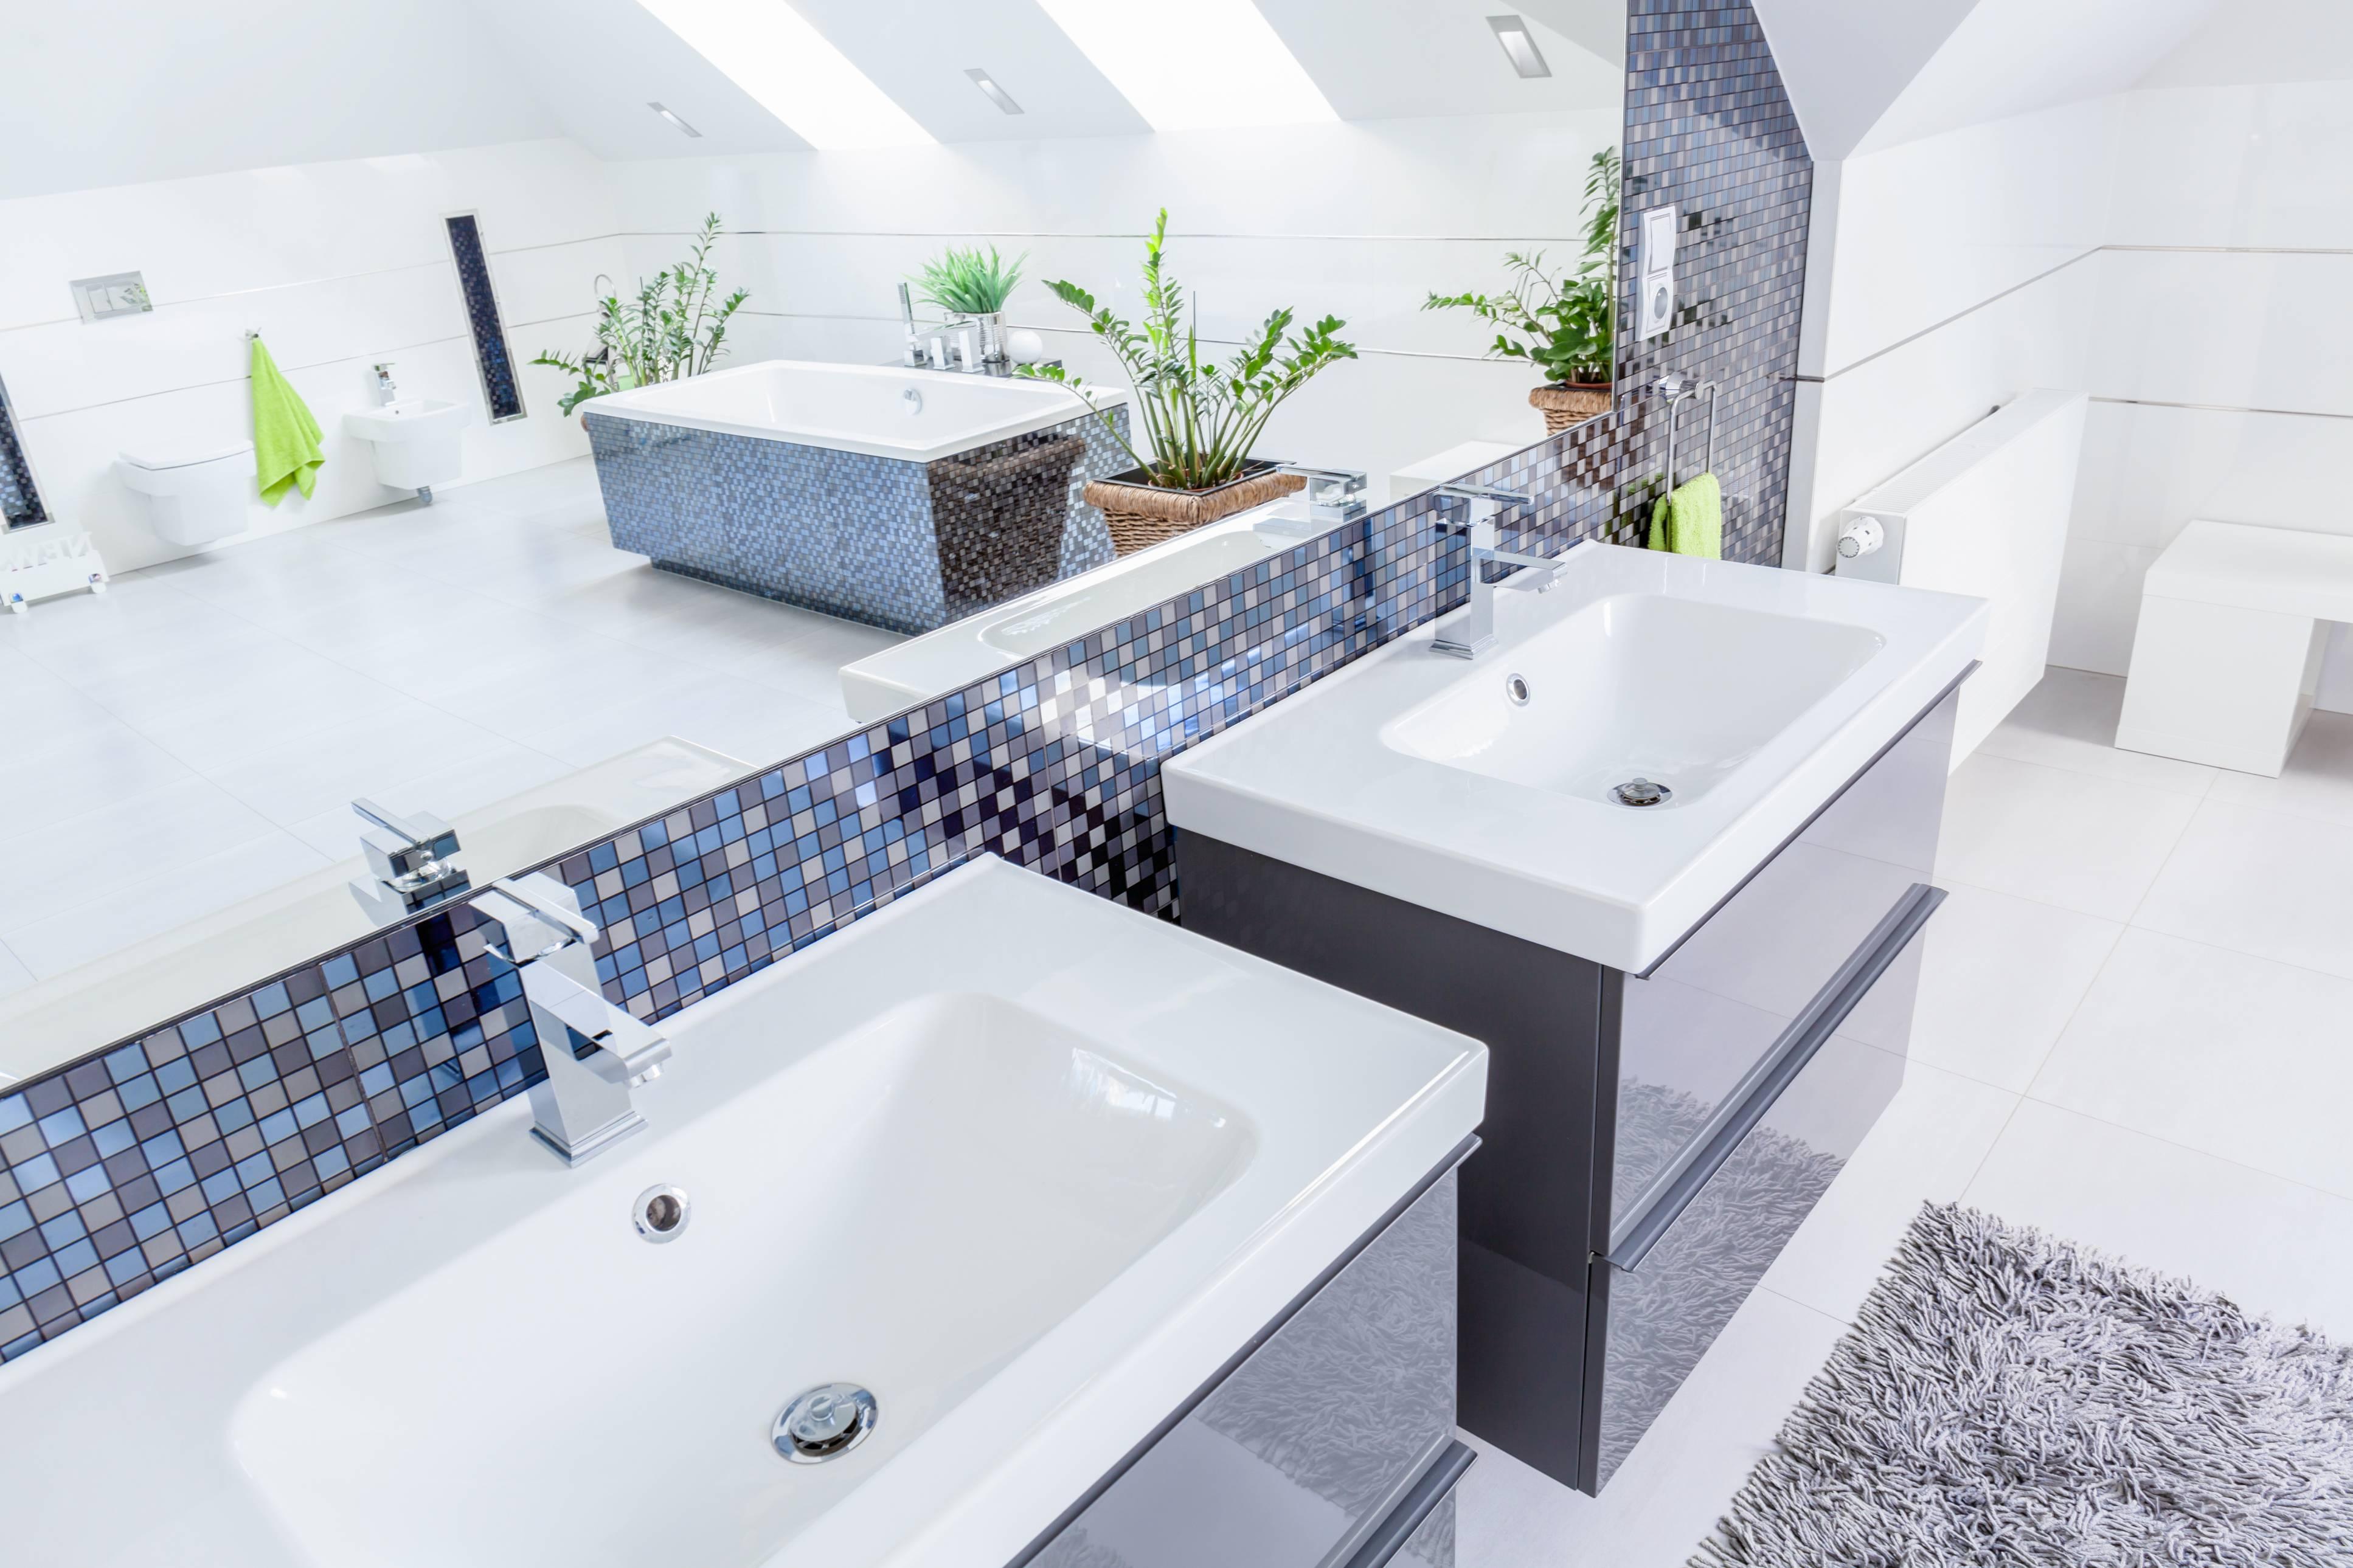 two basins in a bathroom- traqline kitchen and bath market shares